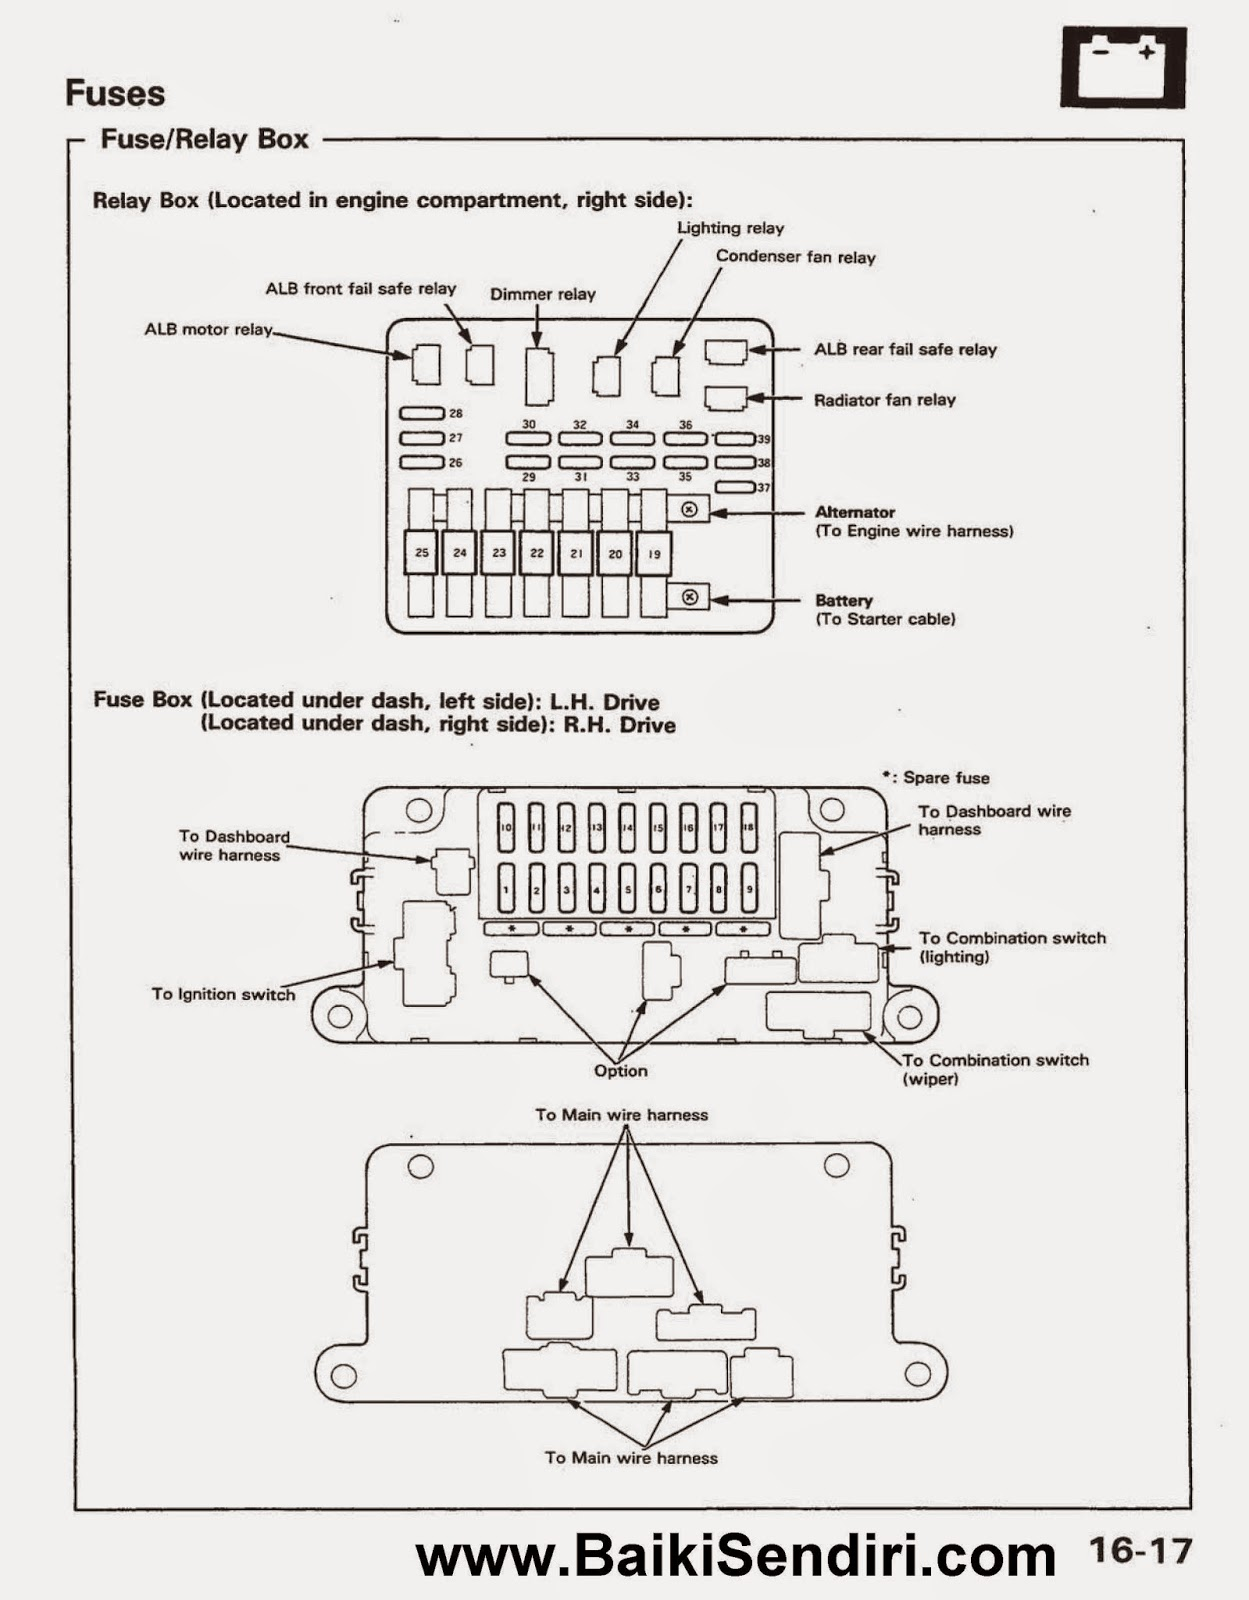 Fuse Box Kancil 850 | Wiring Diagrams Fuse Box Viva on